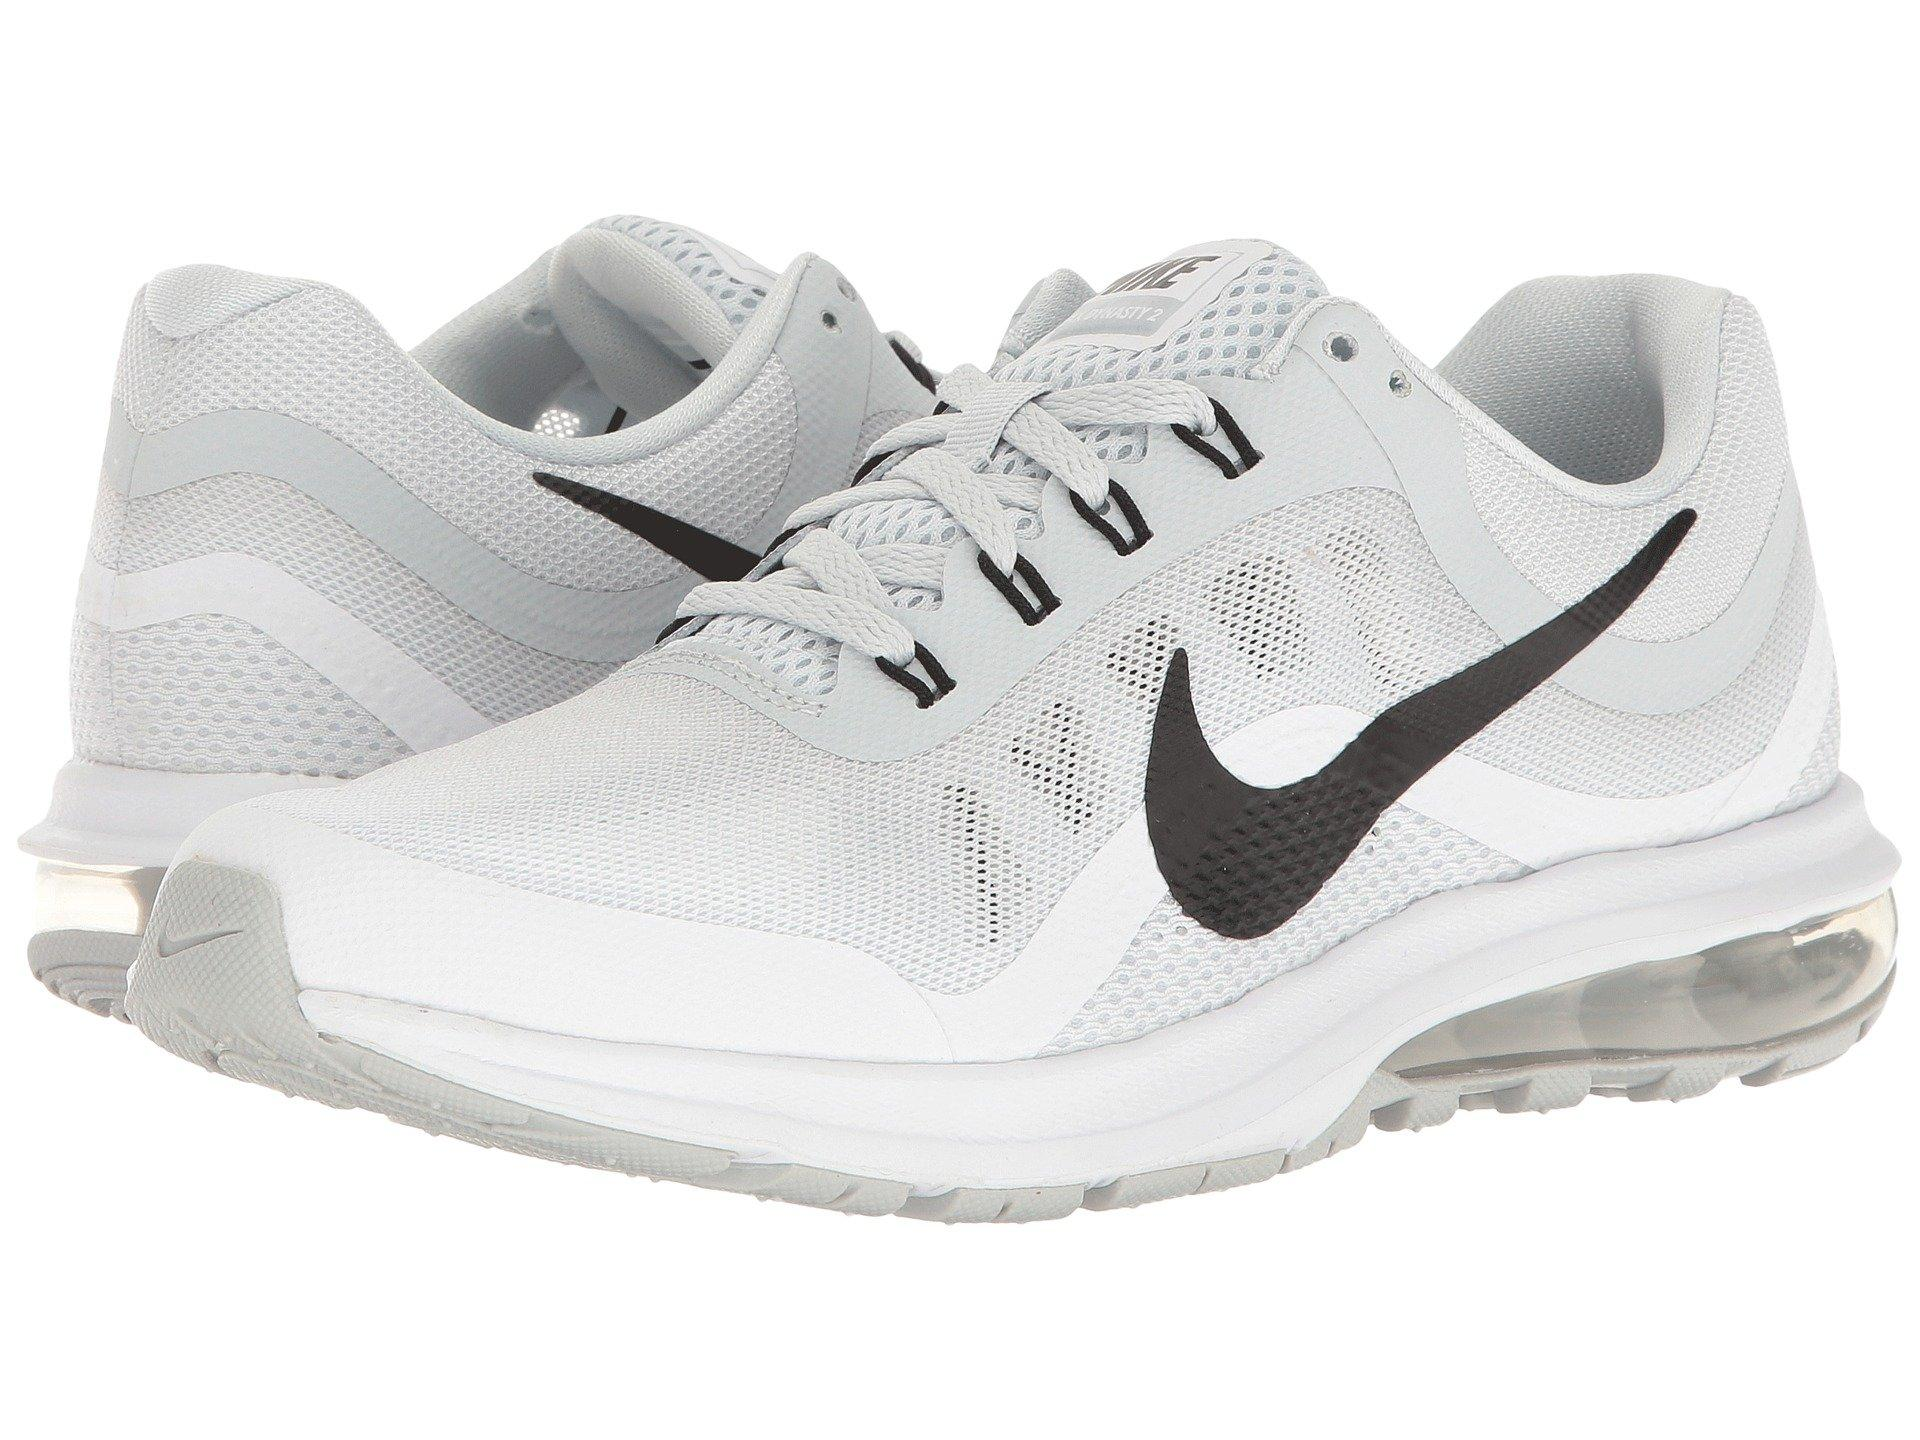 e2e5c81b69 Nike Air Max Dynasty 2 In White/Lava Glow/Wolf Grey | ModeSens